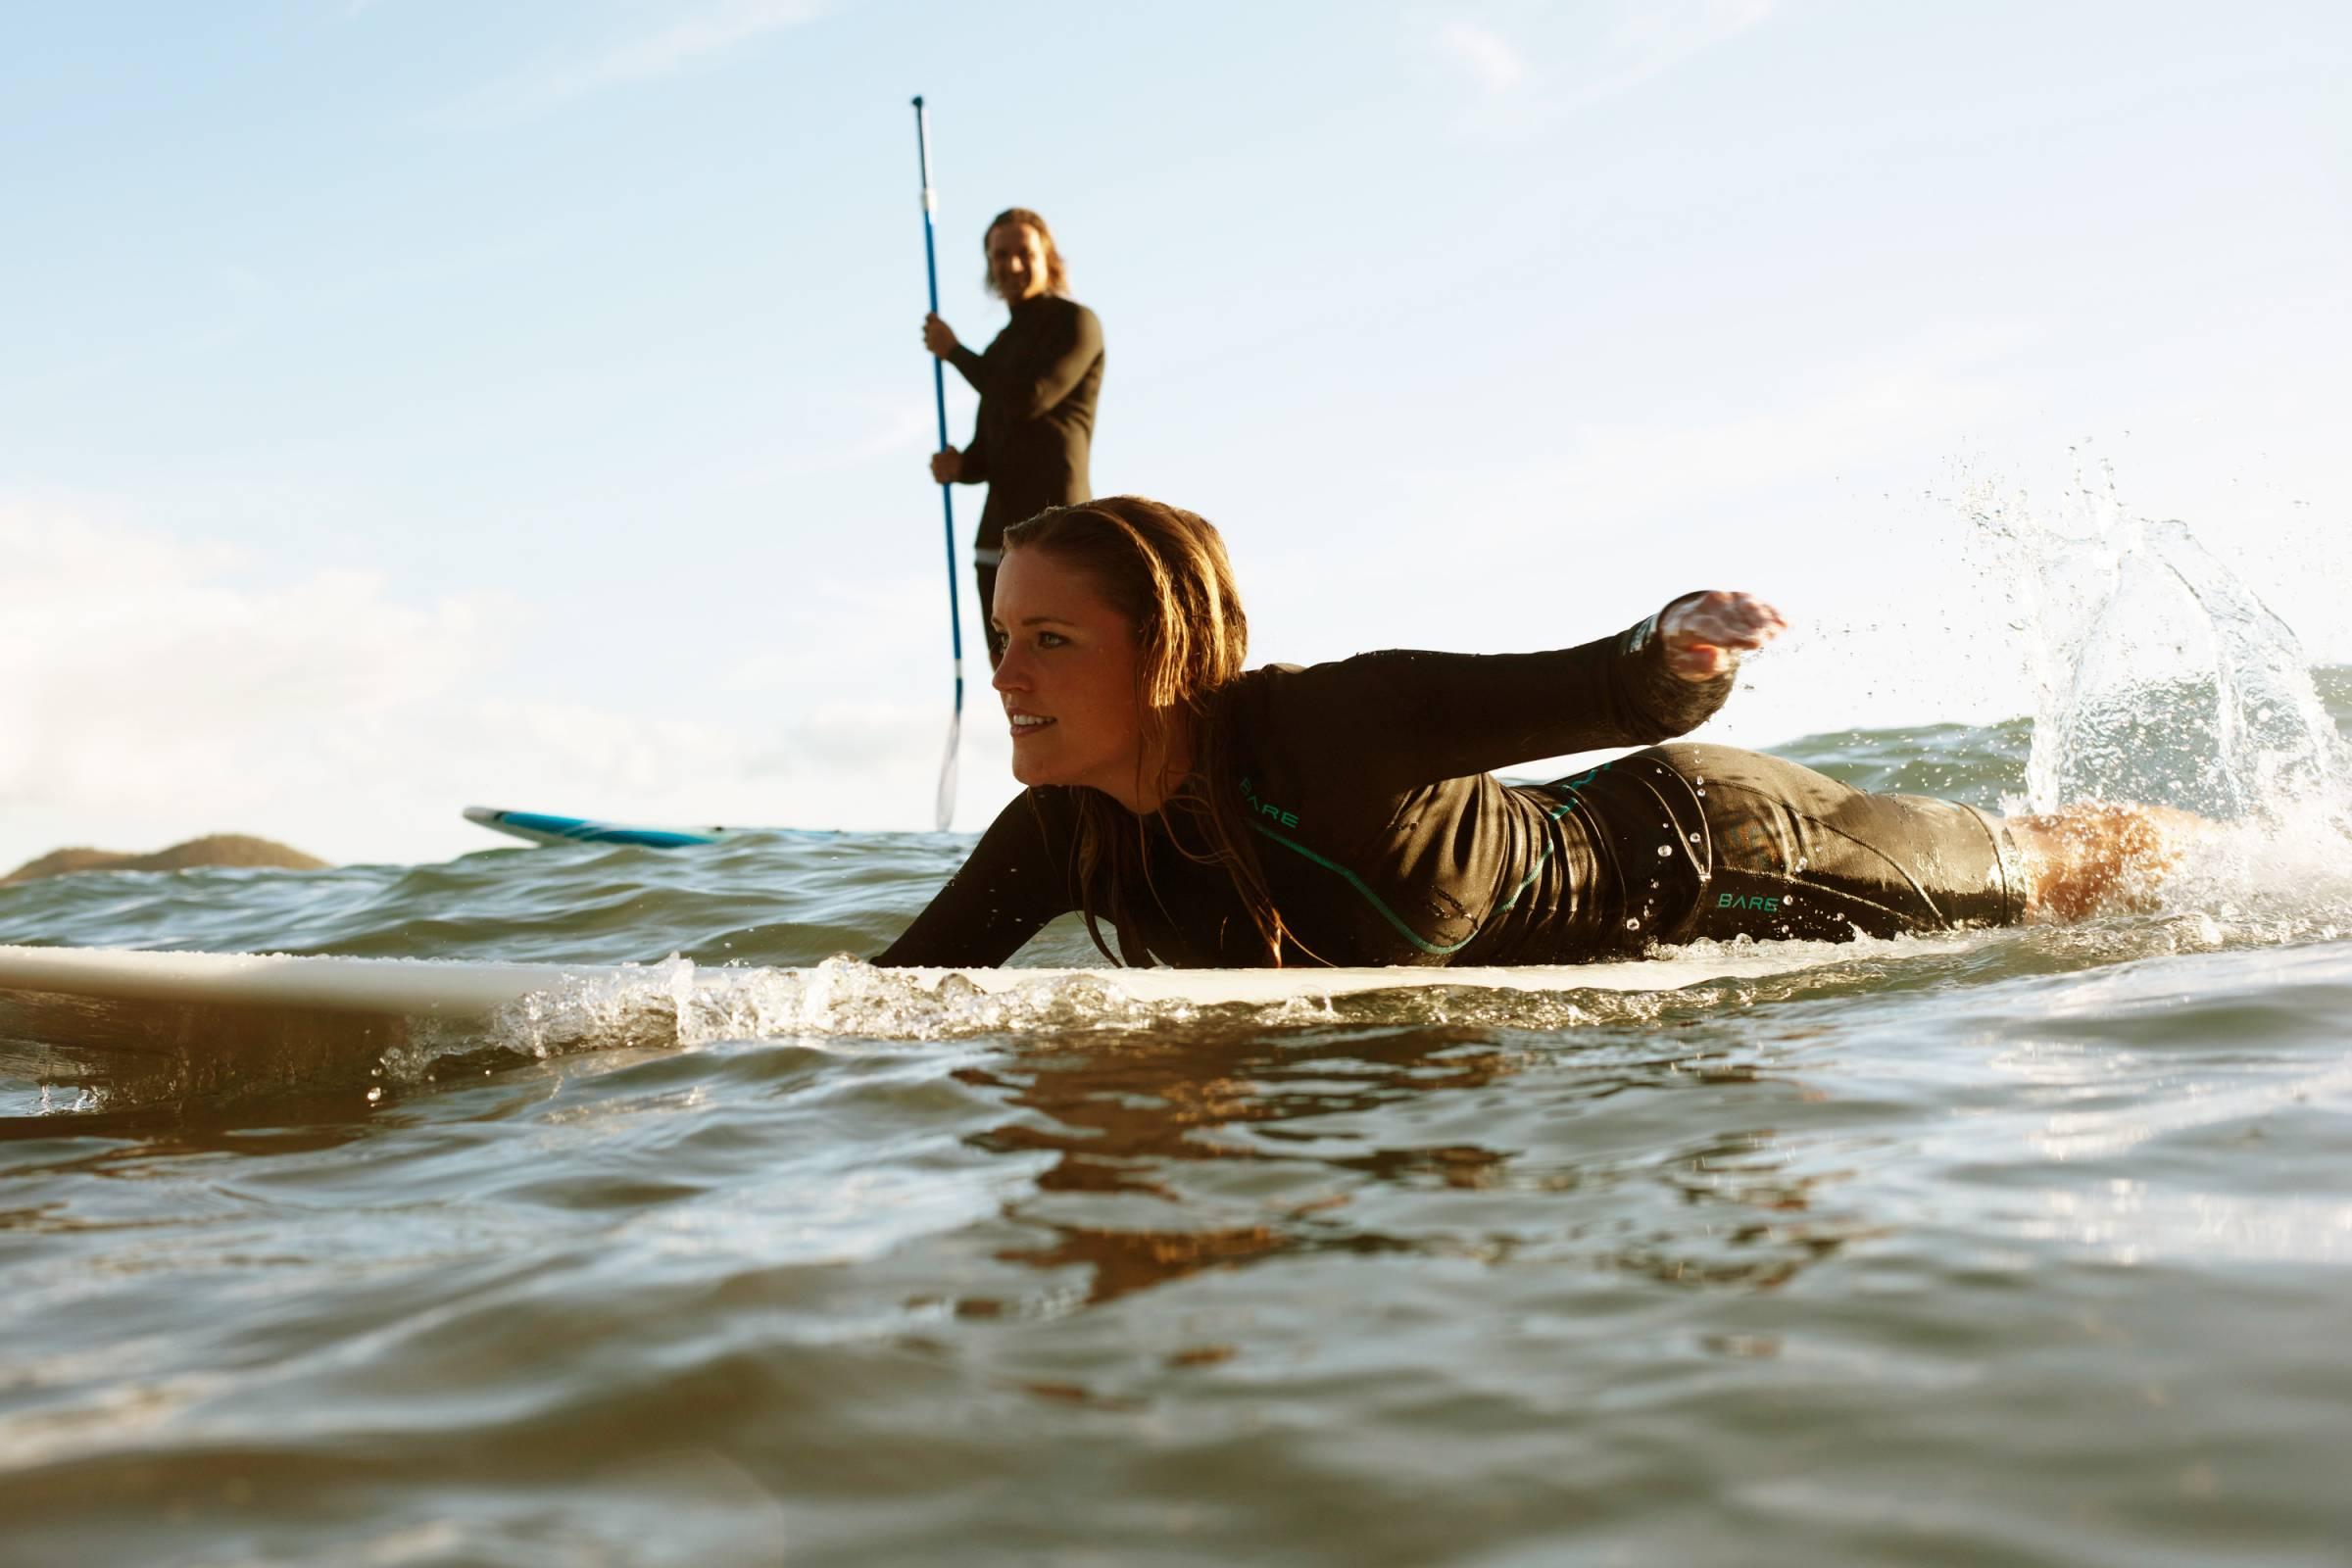 woman paddling on board, man on SUP